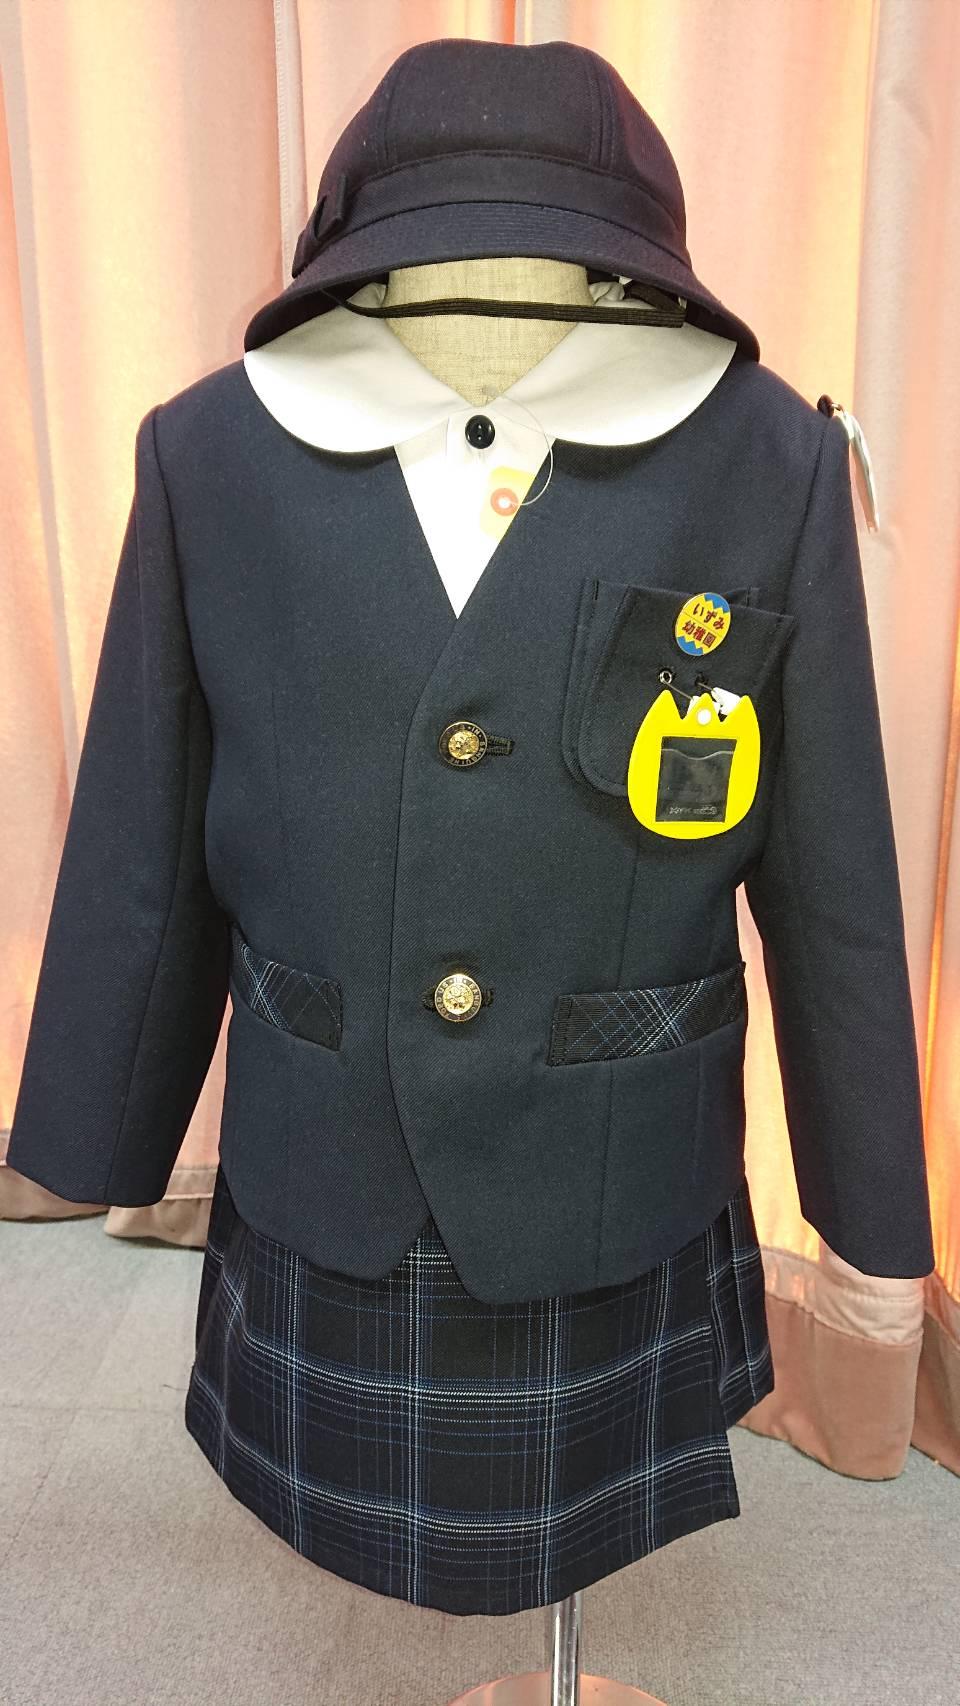 http://www.fukuokaizumi.com/2019/11/05/16943.jpg